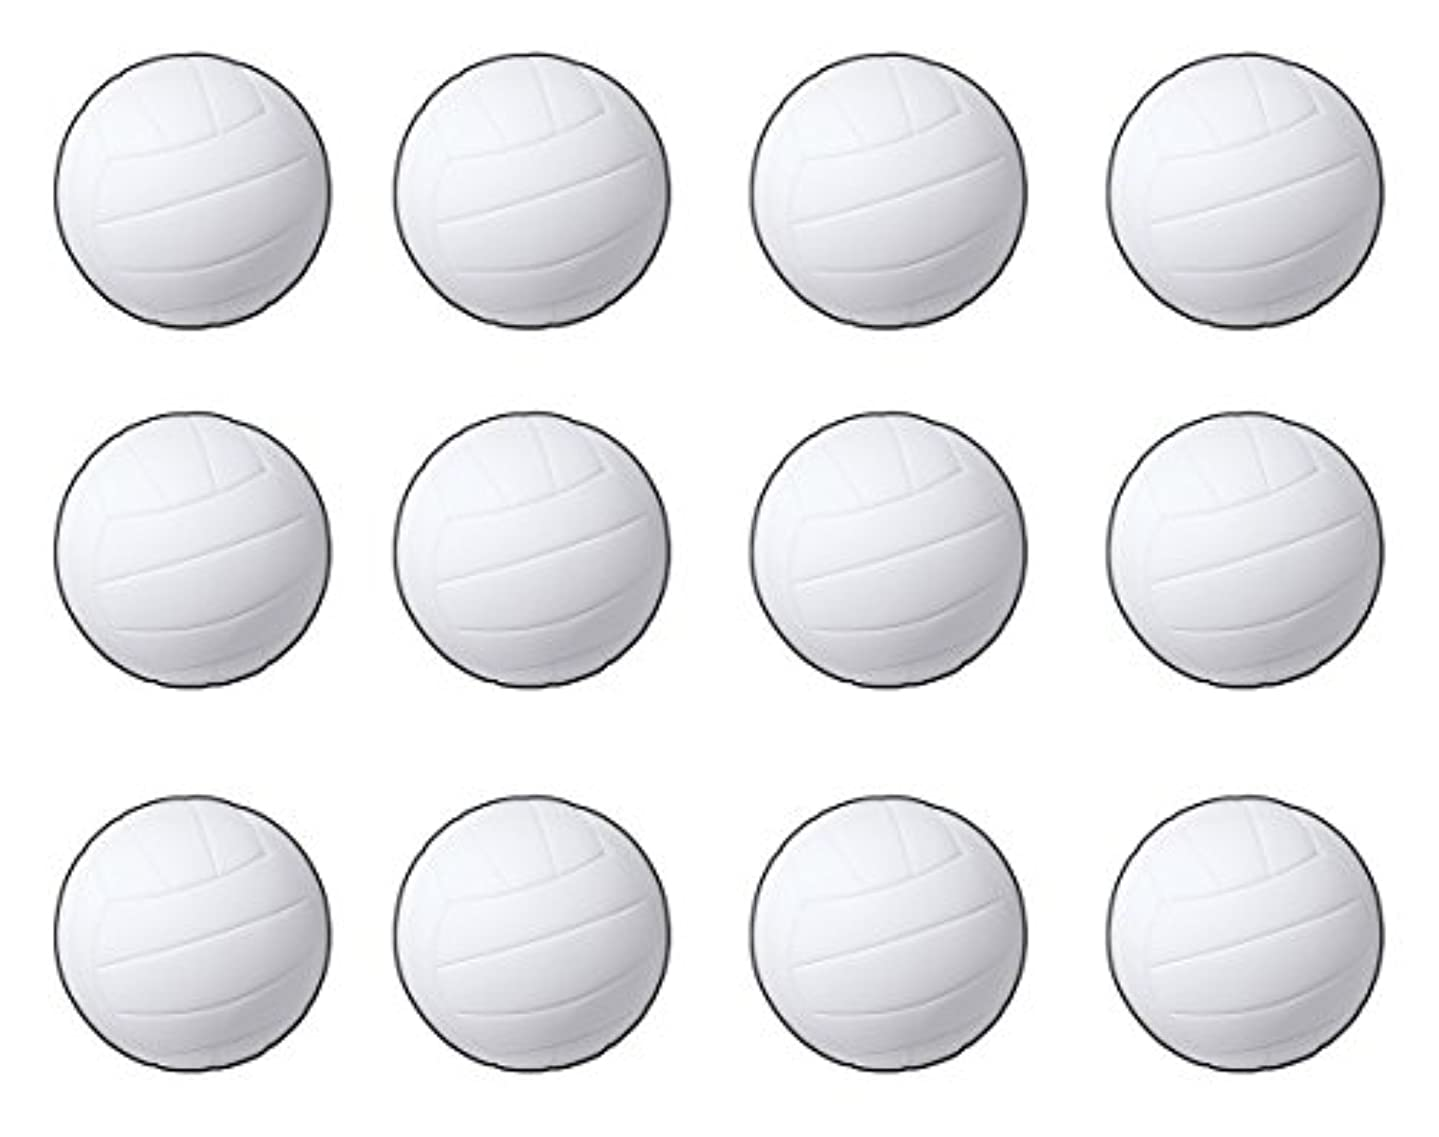 Beistle S55087AZ12, 12 Piece Volleyball Cutouts, 13.5'' (White/Black)